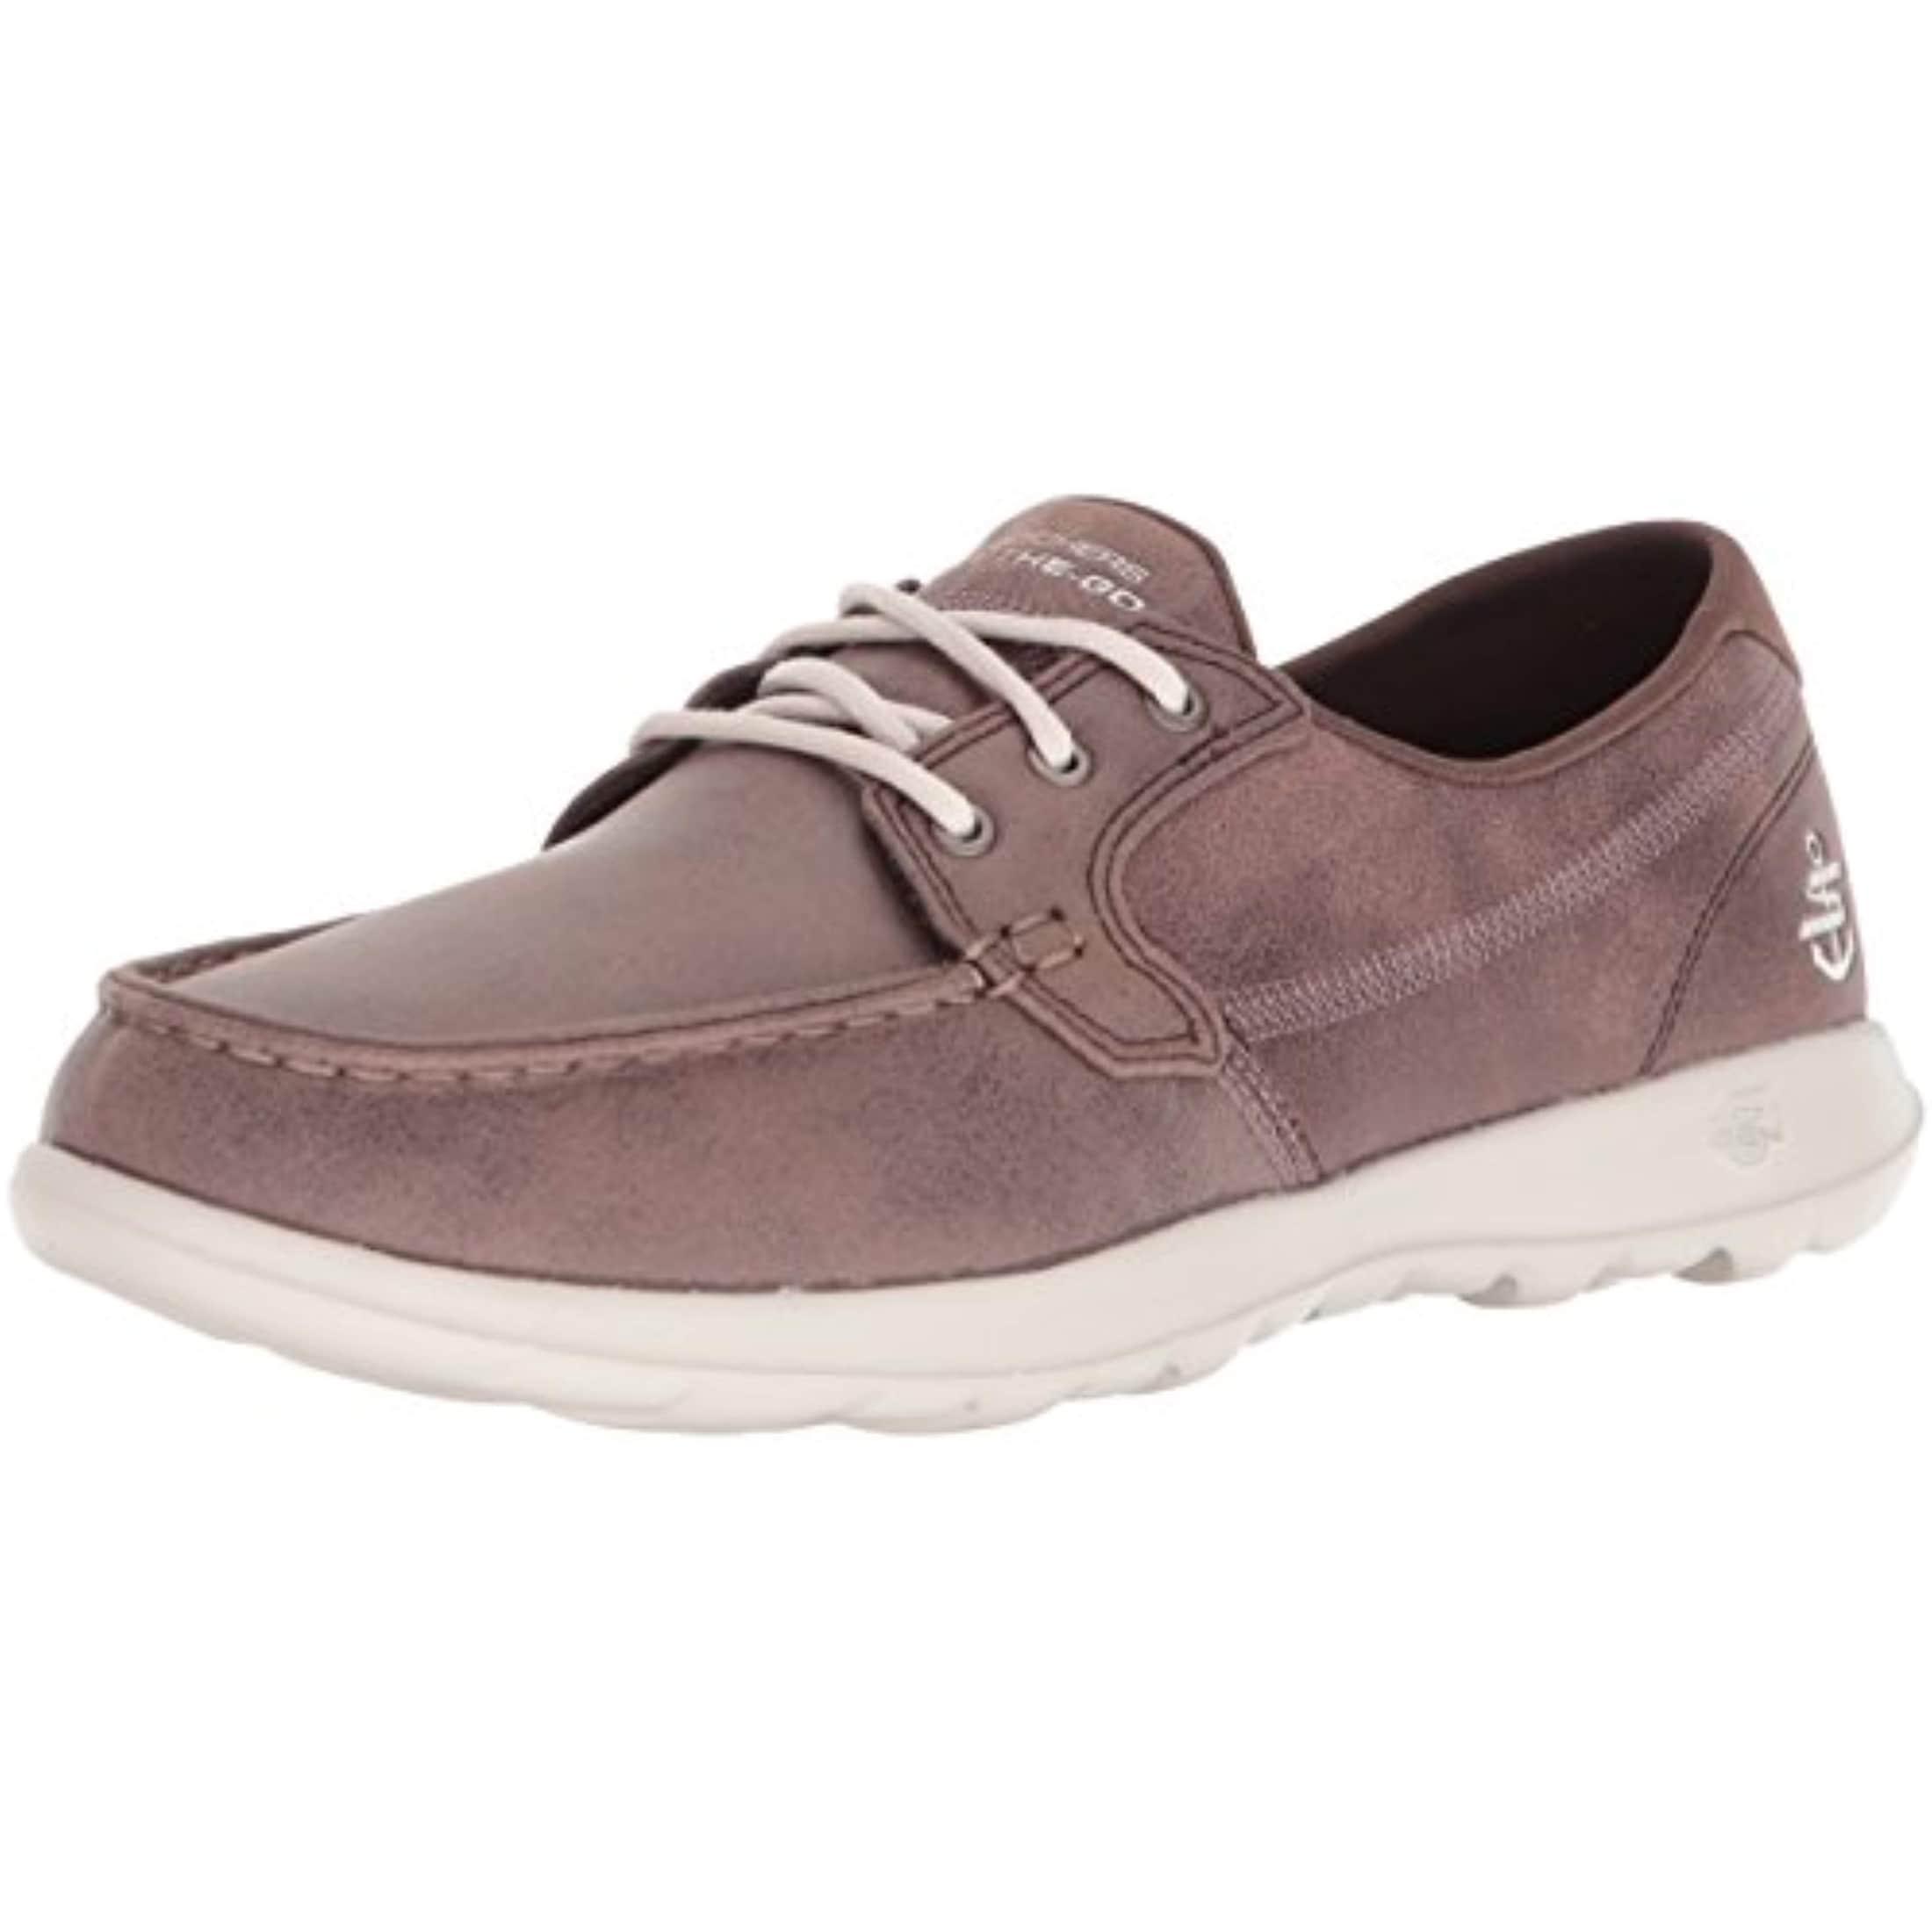 d0e2760c7162e Shop Skechers Performance Women's Go Walk Lite Boat Shoe,Brown - Free  Shipping Today - Overstock - 27121531